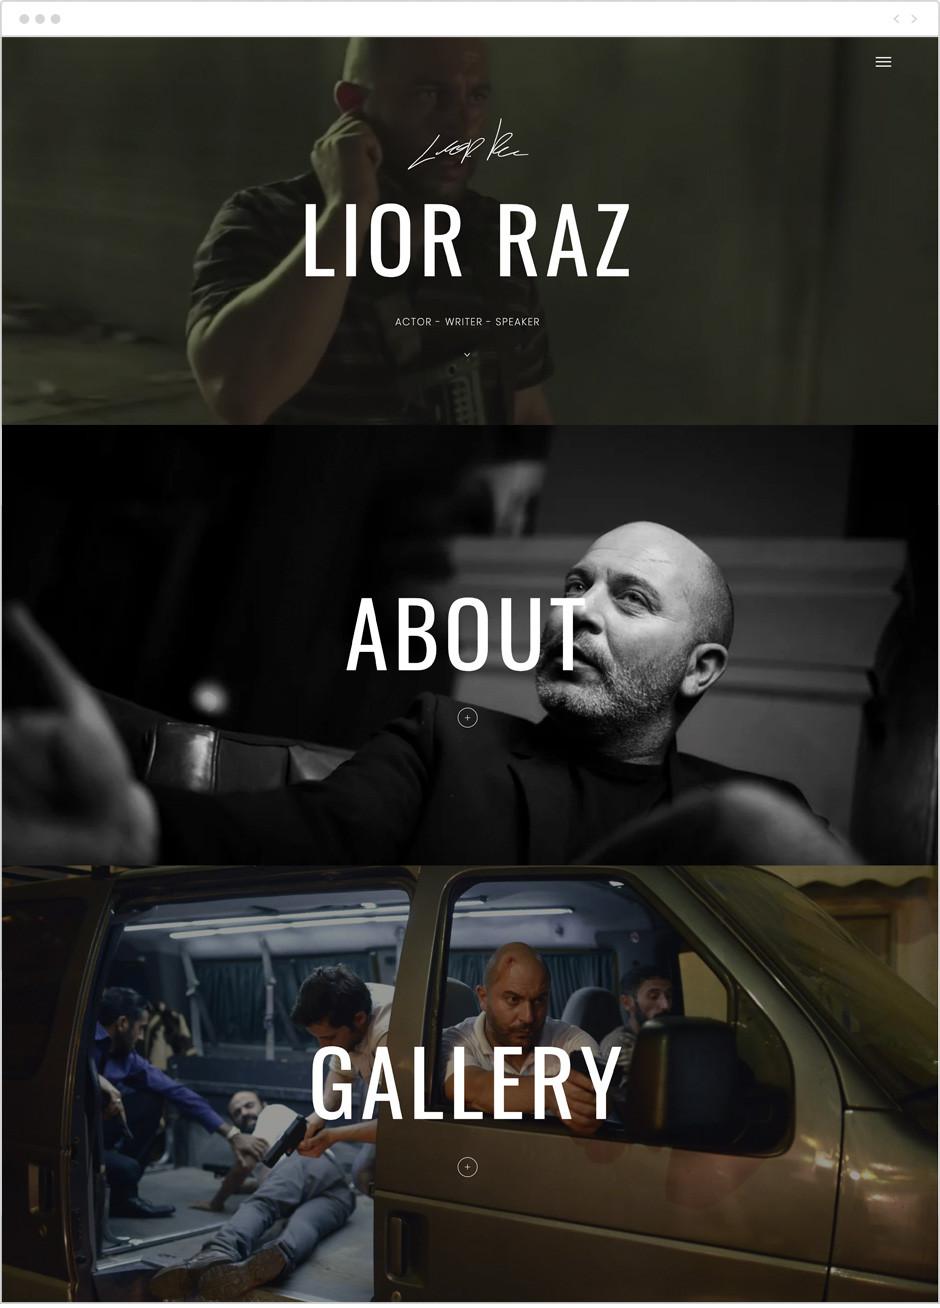 Actor website by Lior Raz